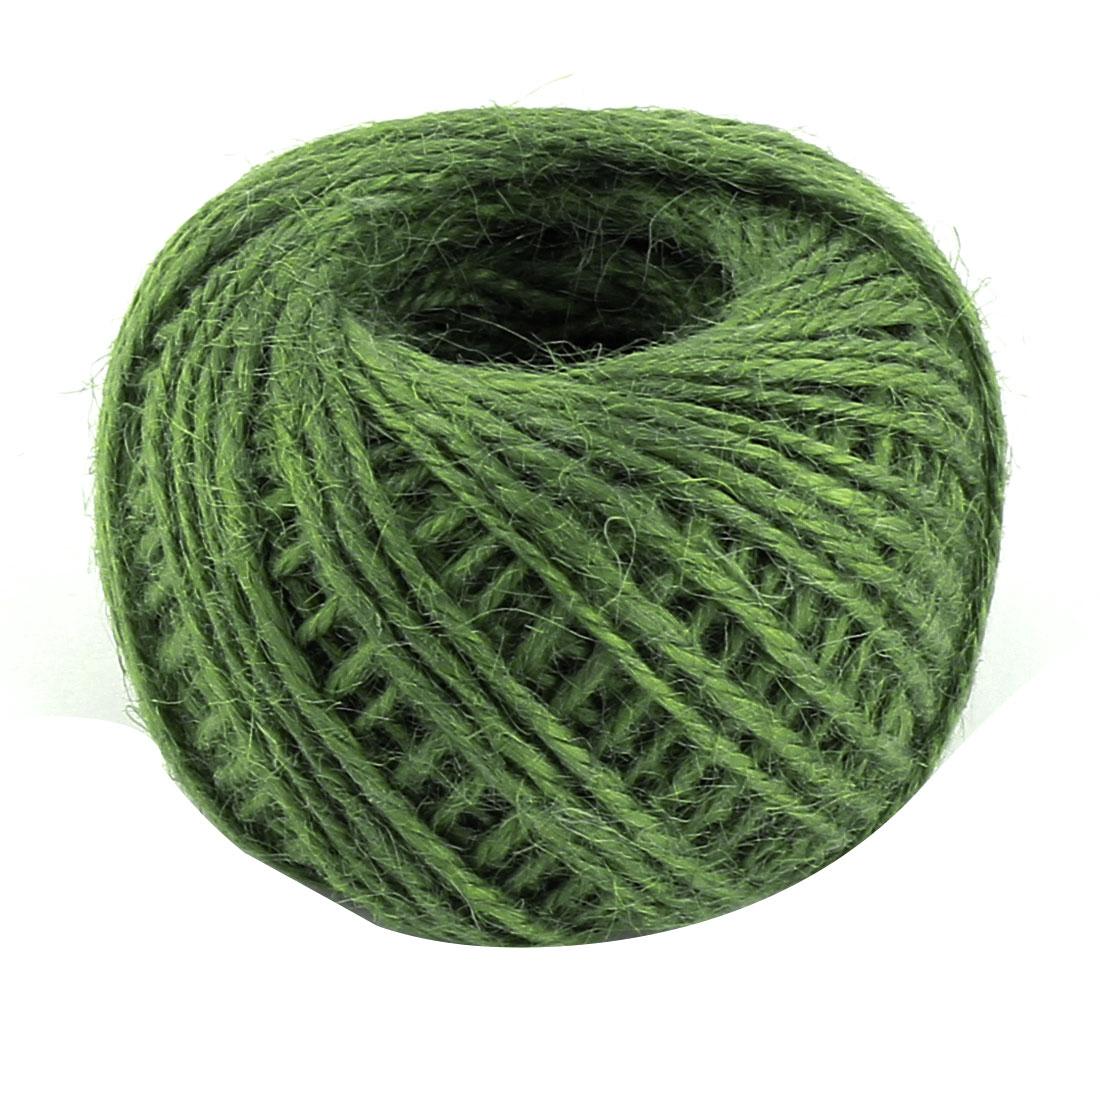 Jute Burlap Ribbon Twine Rope Cord String Pack Roll Green 2mm Dia 50m Length